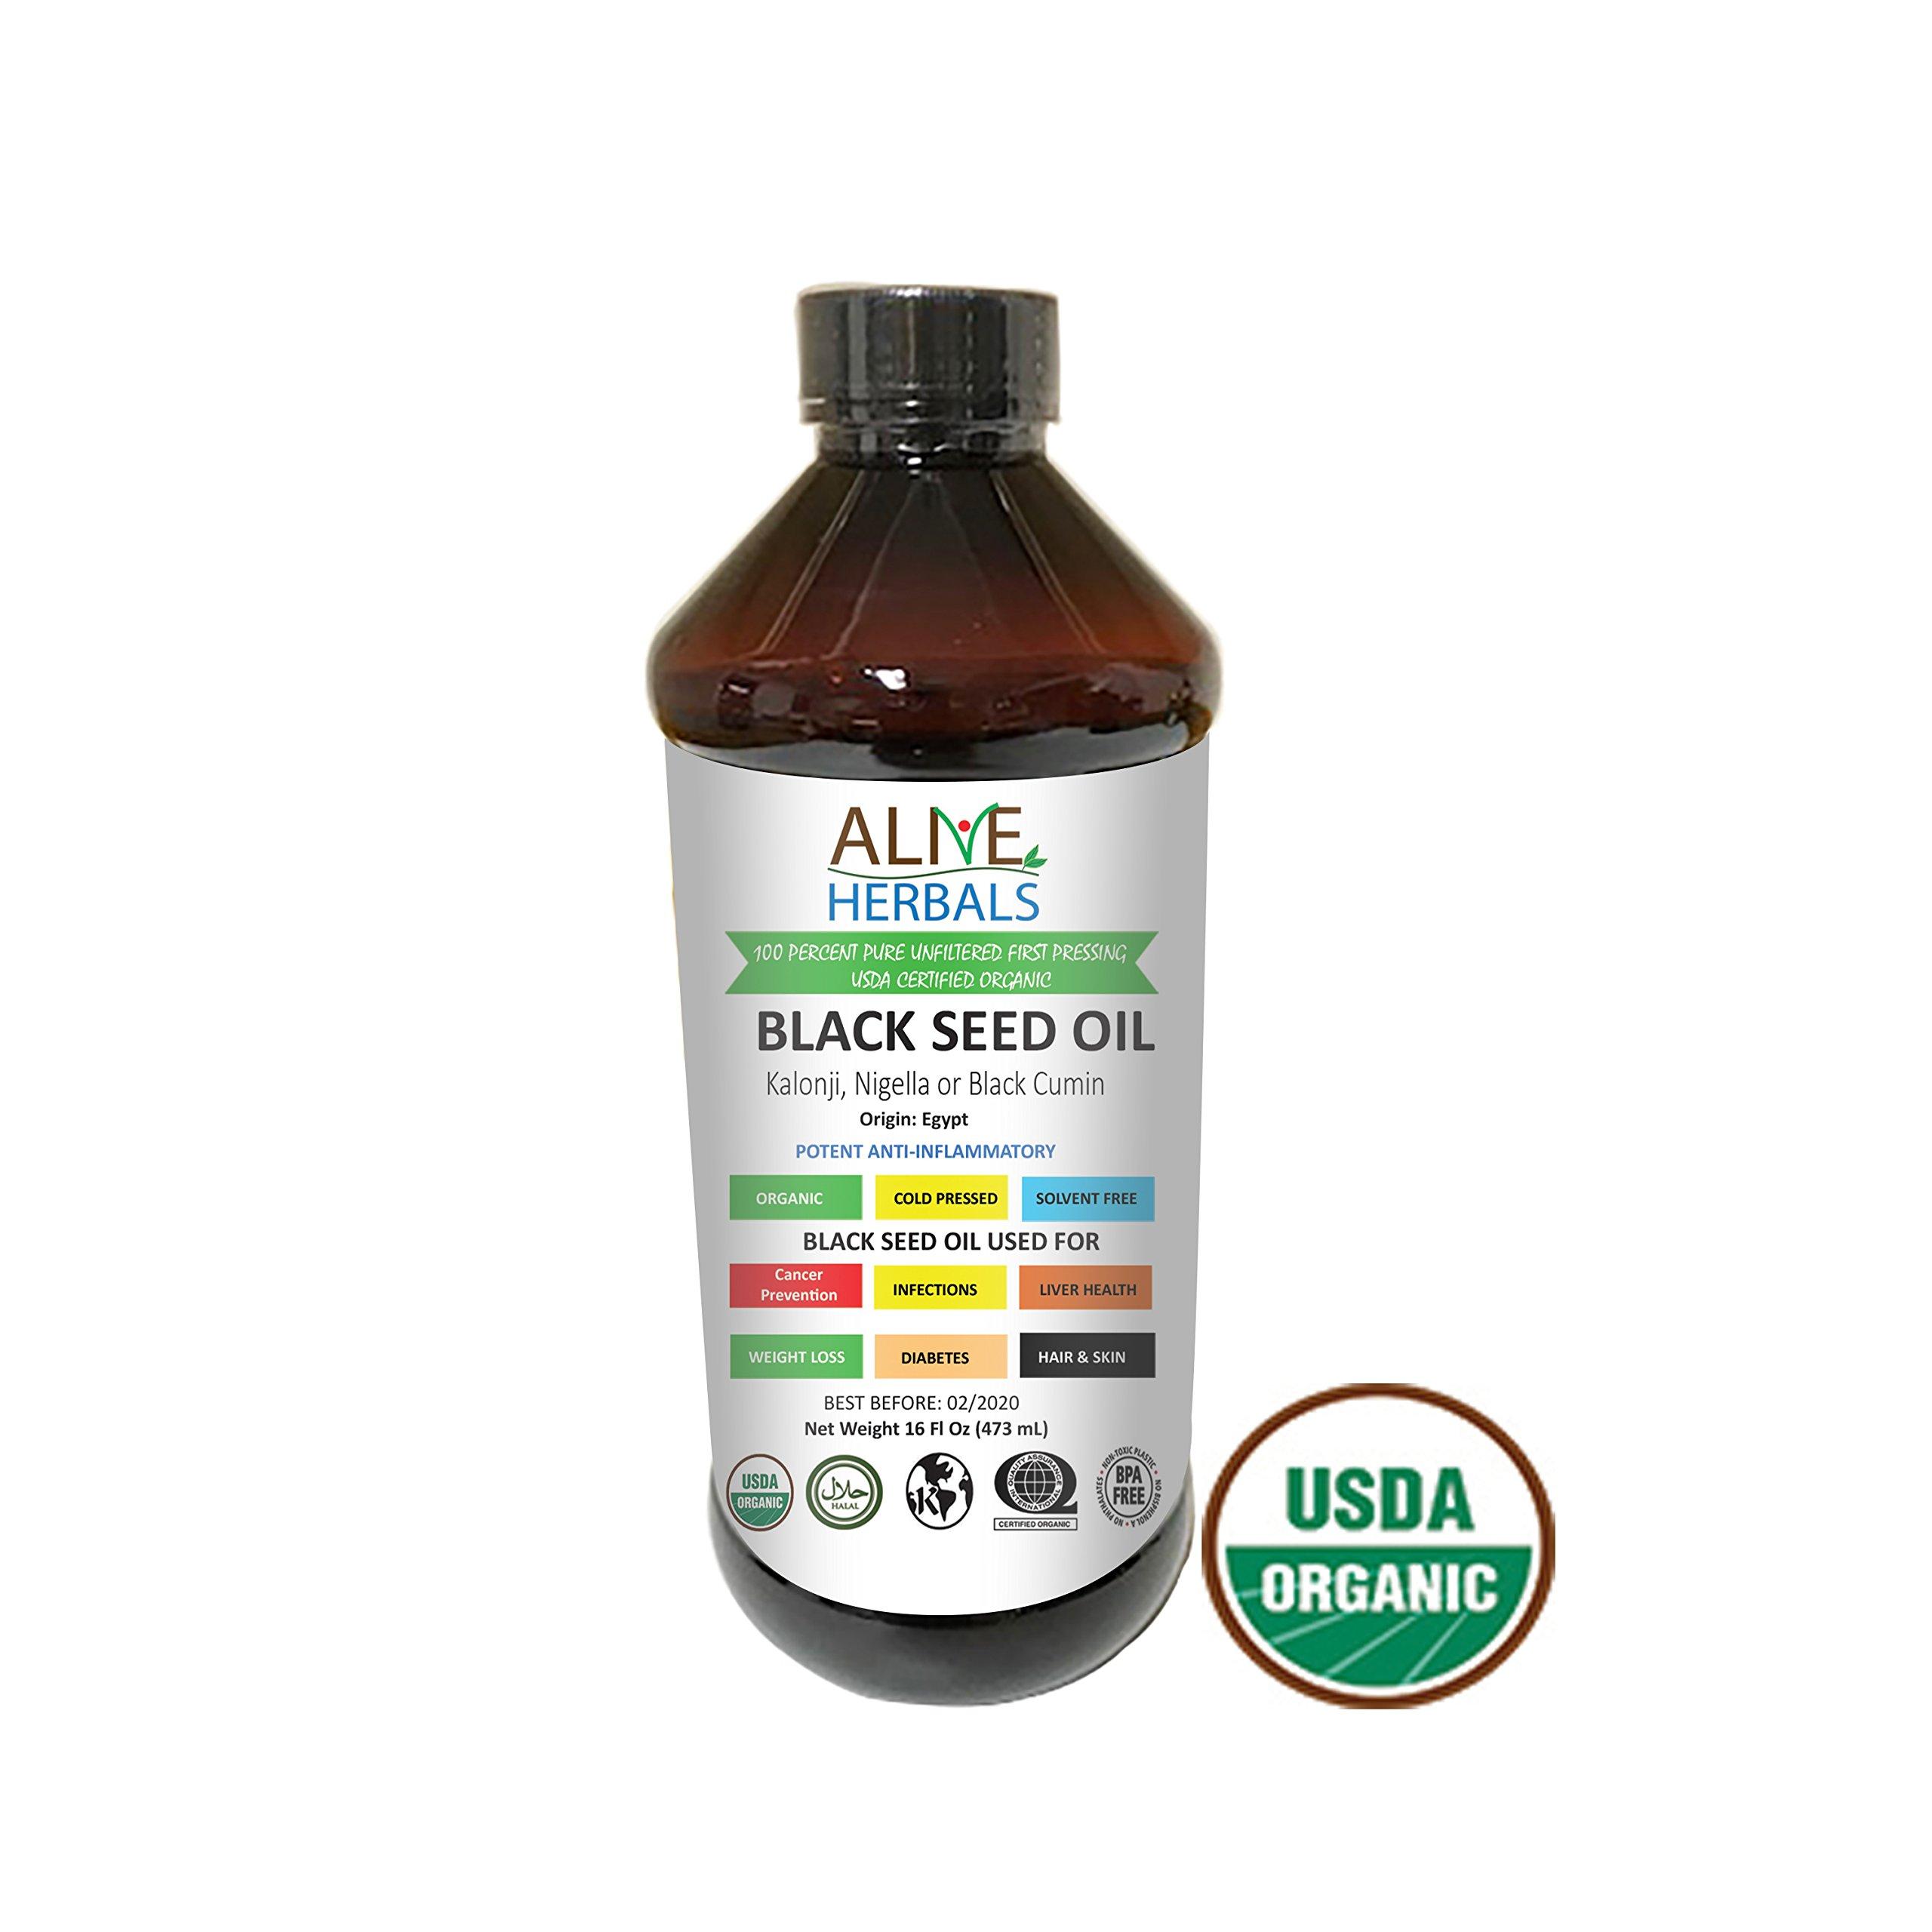 Alive Herbal Black Seed Oil - Egypt- Nigella Sativa - Virgin 100% Raw Organic Cold Pressed, Unfiltered, Vegan & Non-GMO, No Preservatives & Artificial Color- BPA Free Food Grade Plastic Bottle- 16 OZ.